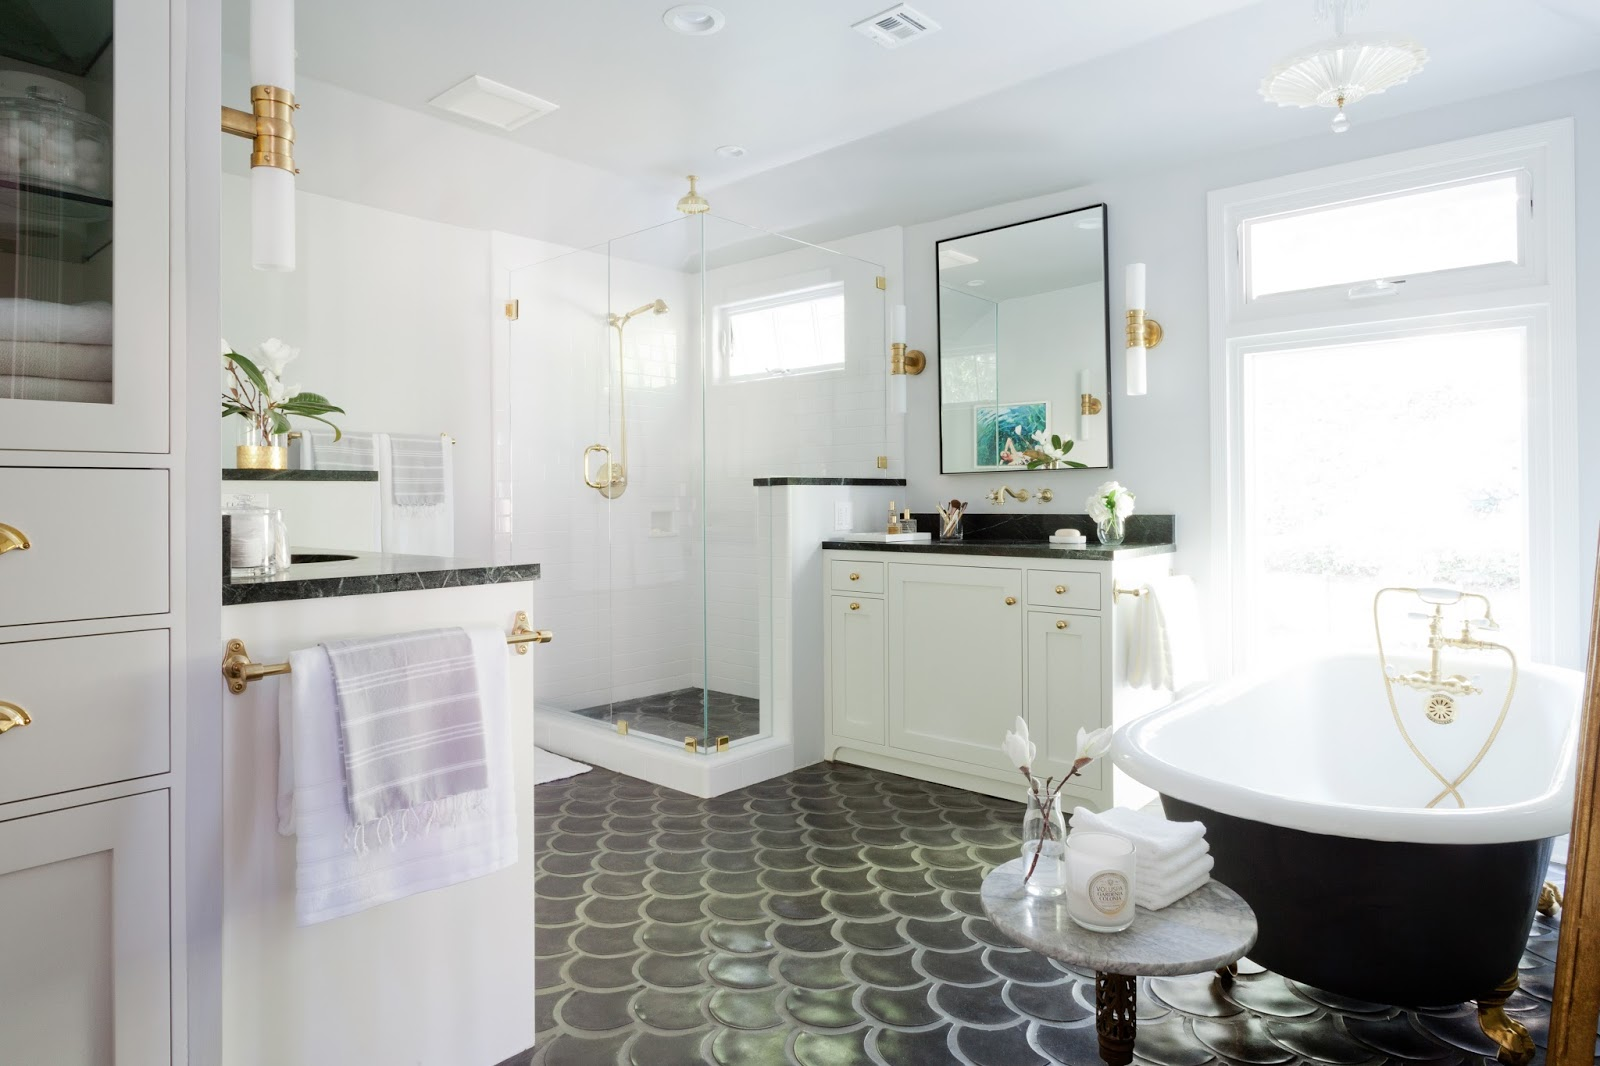 1930s Bathroom Rosa Beltran Design Deluxe Double Bathroom Remodel Published On